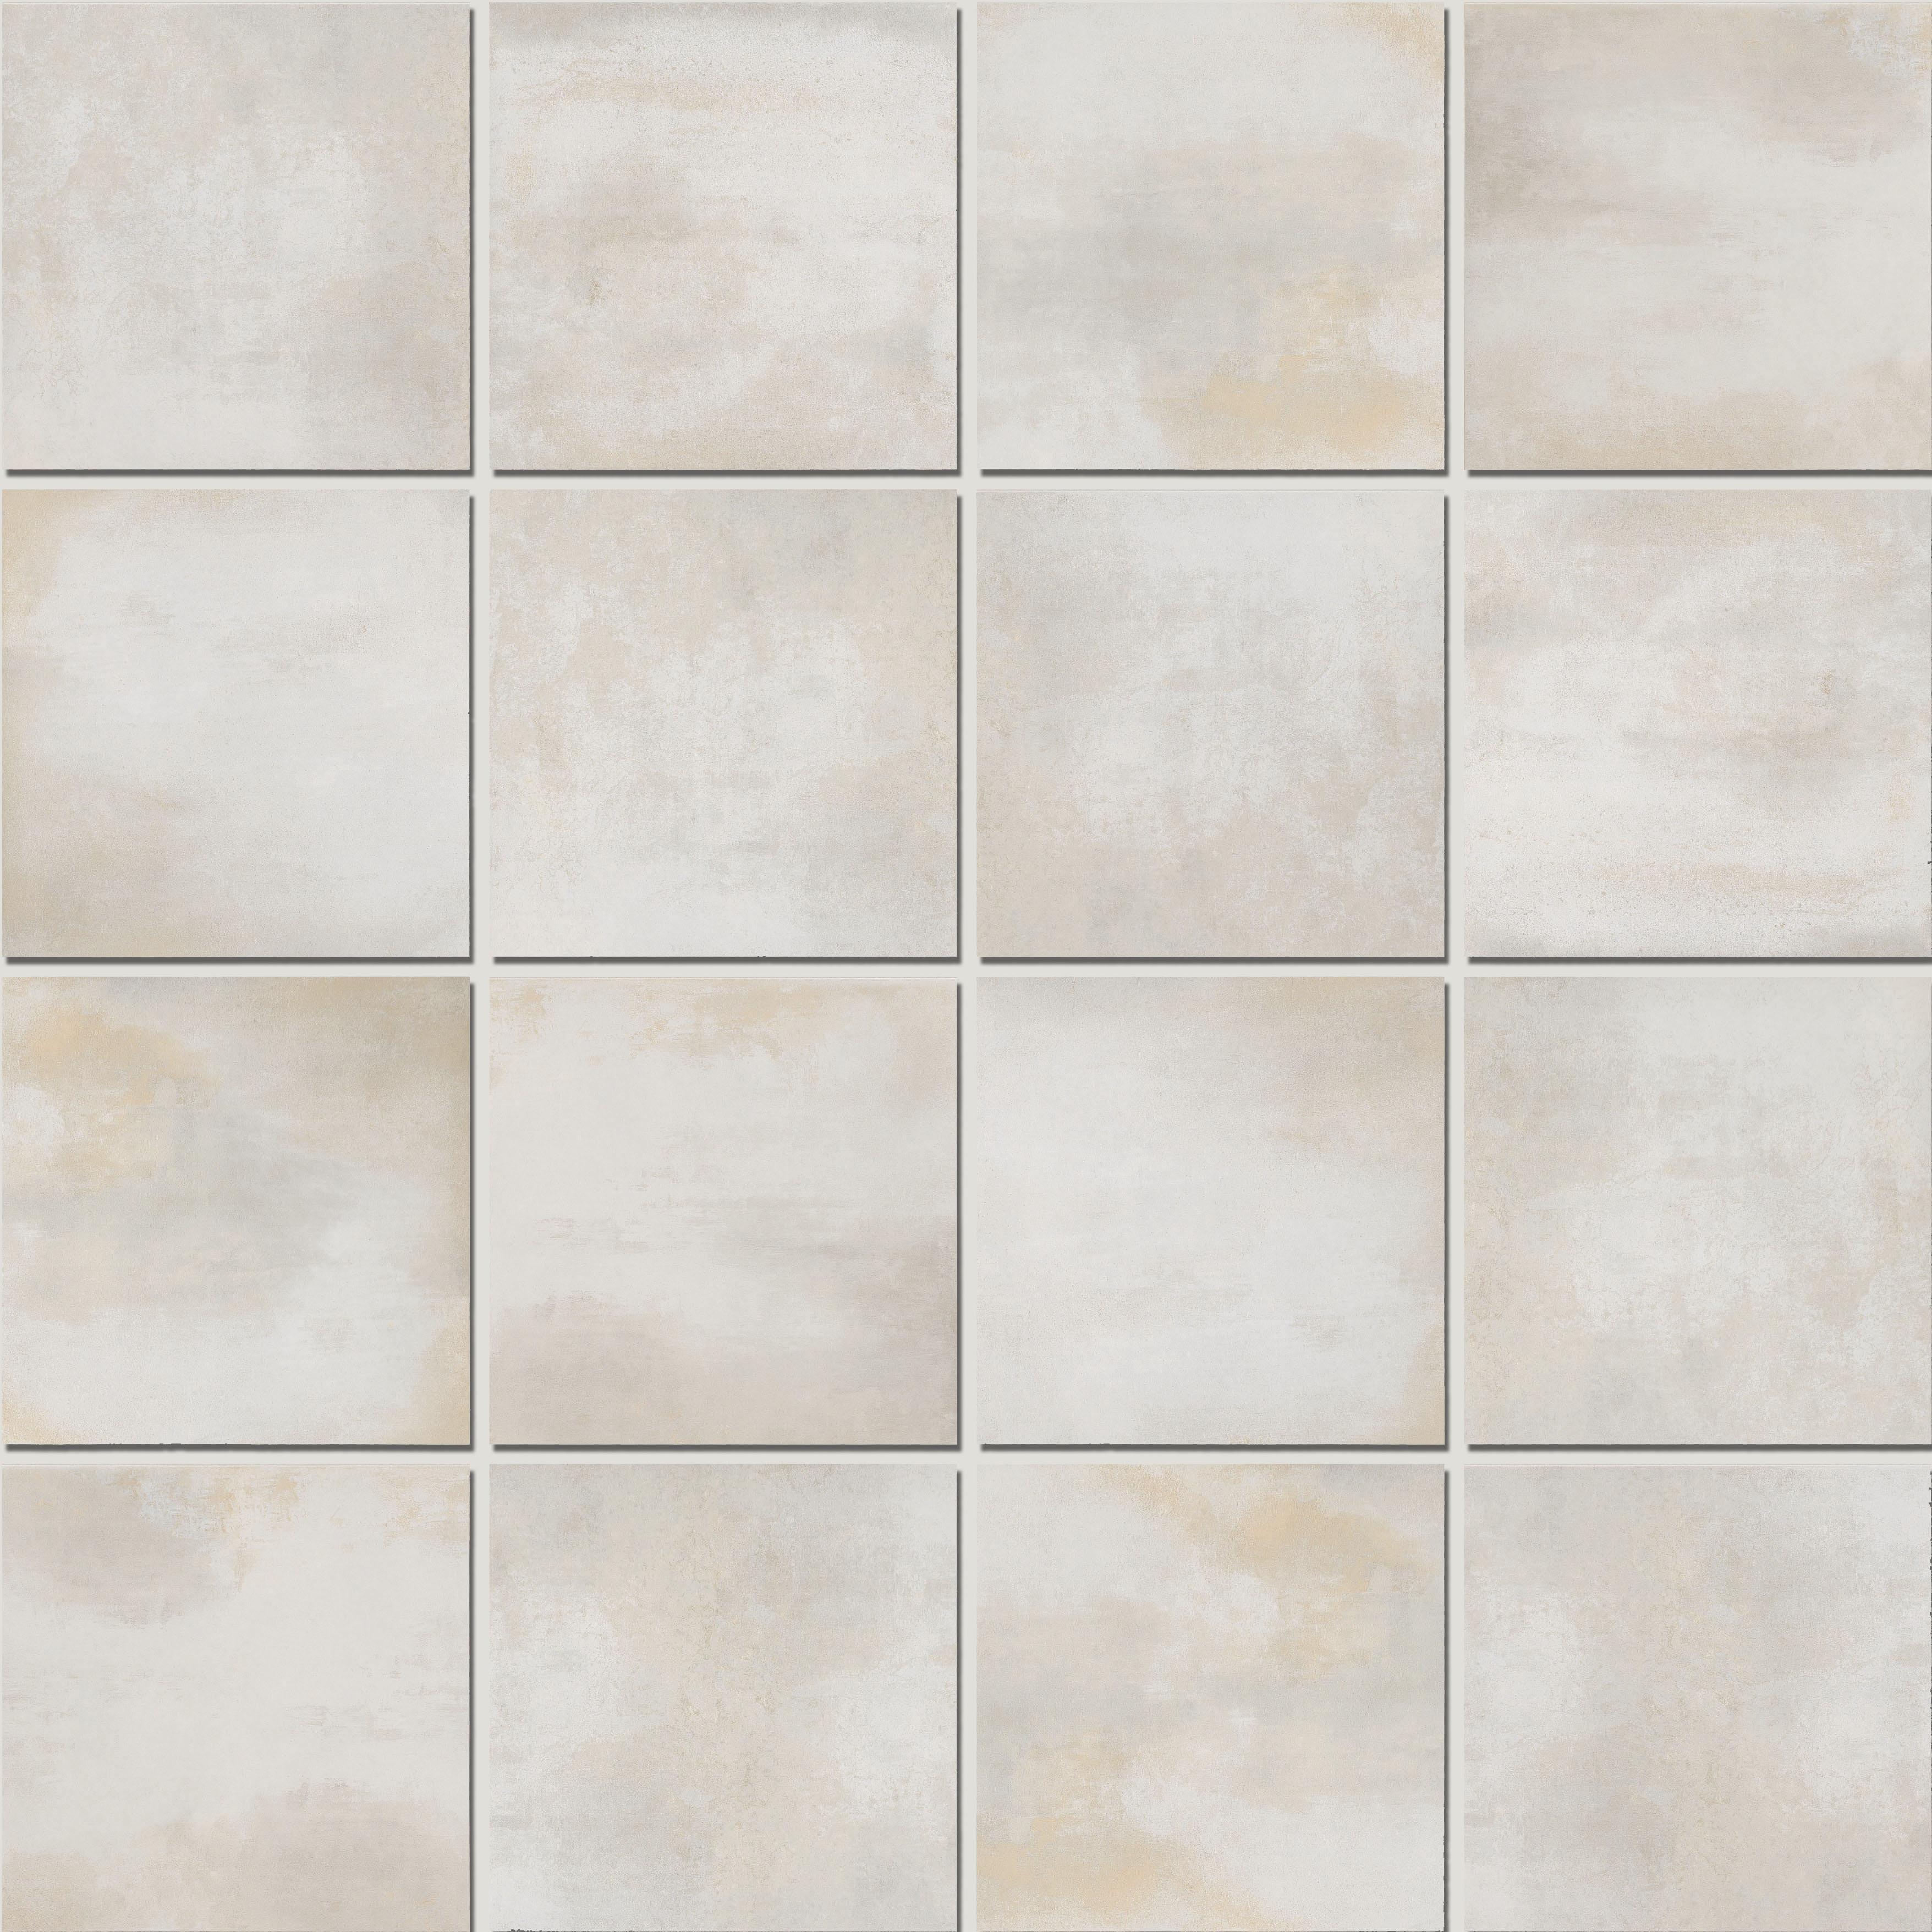 Mosaic 7,2x7,2 Shabby White